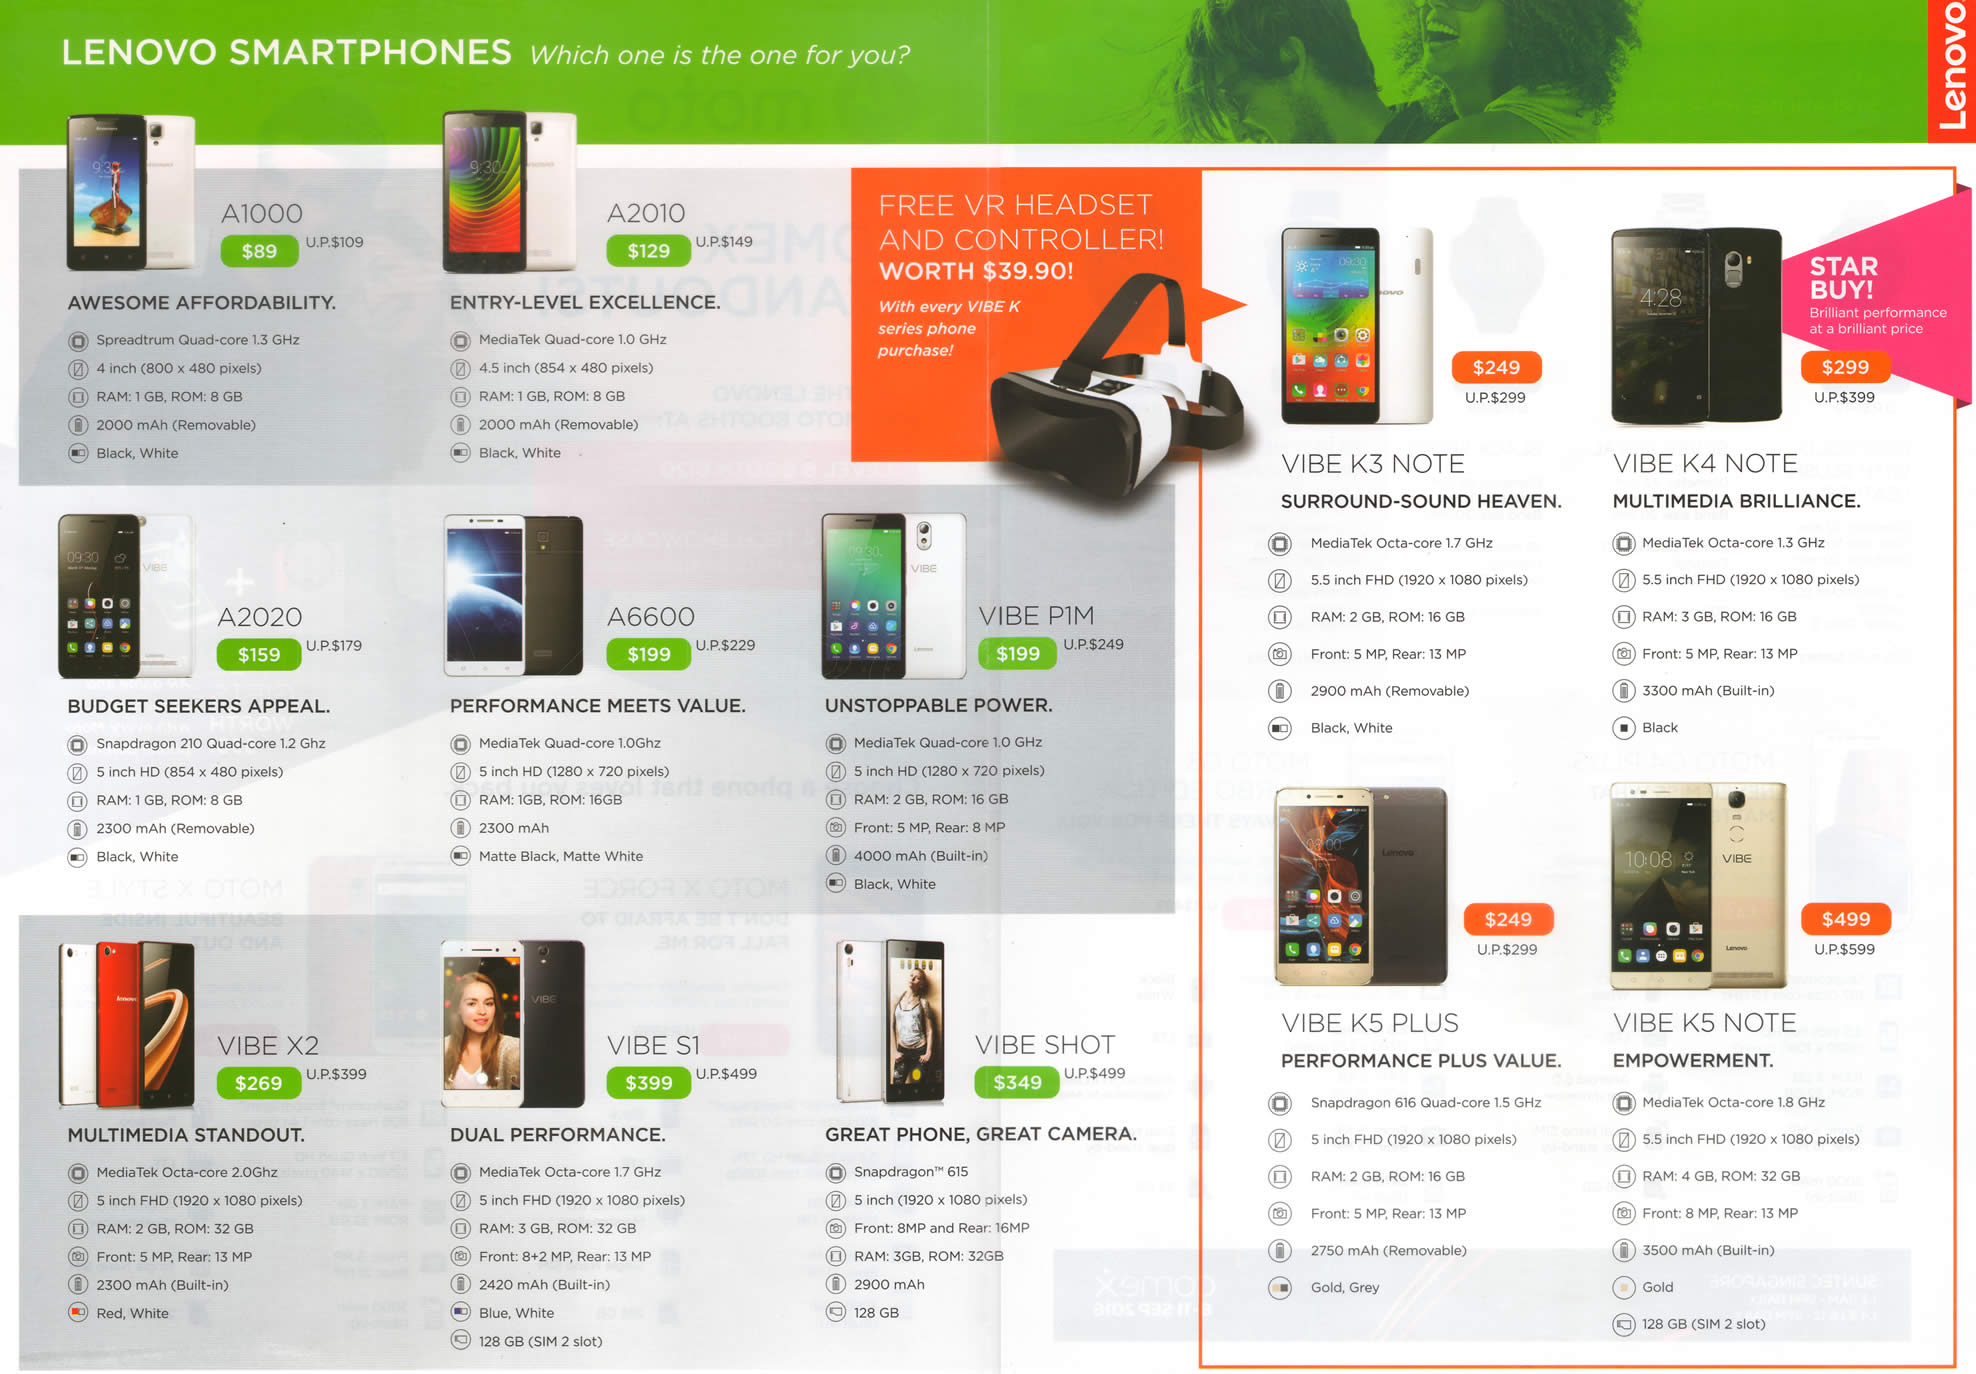 COMEX 2016 price list image brochure of Moto Lenovo Smartphones A1000, A2010, A2020, A6600, Vibe X2, S1, Vibe P1M, Shot, K3, K4, K5 Plus, K5 Note 2